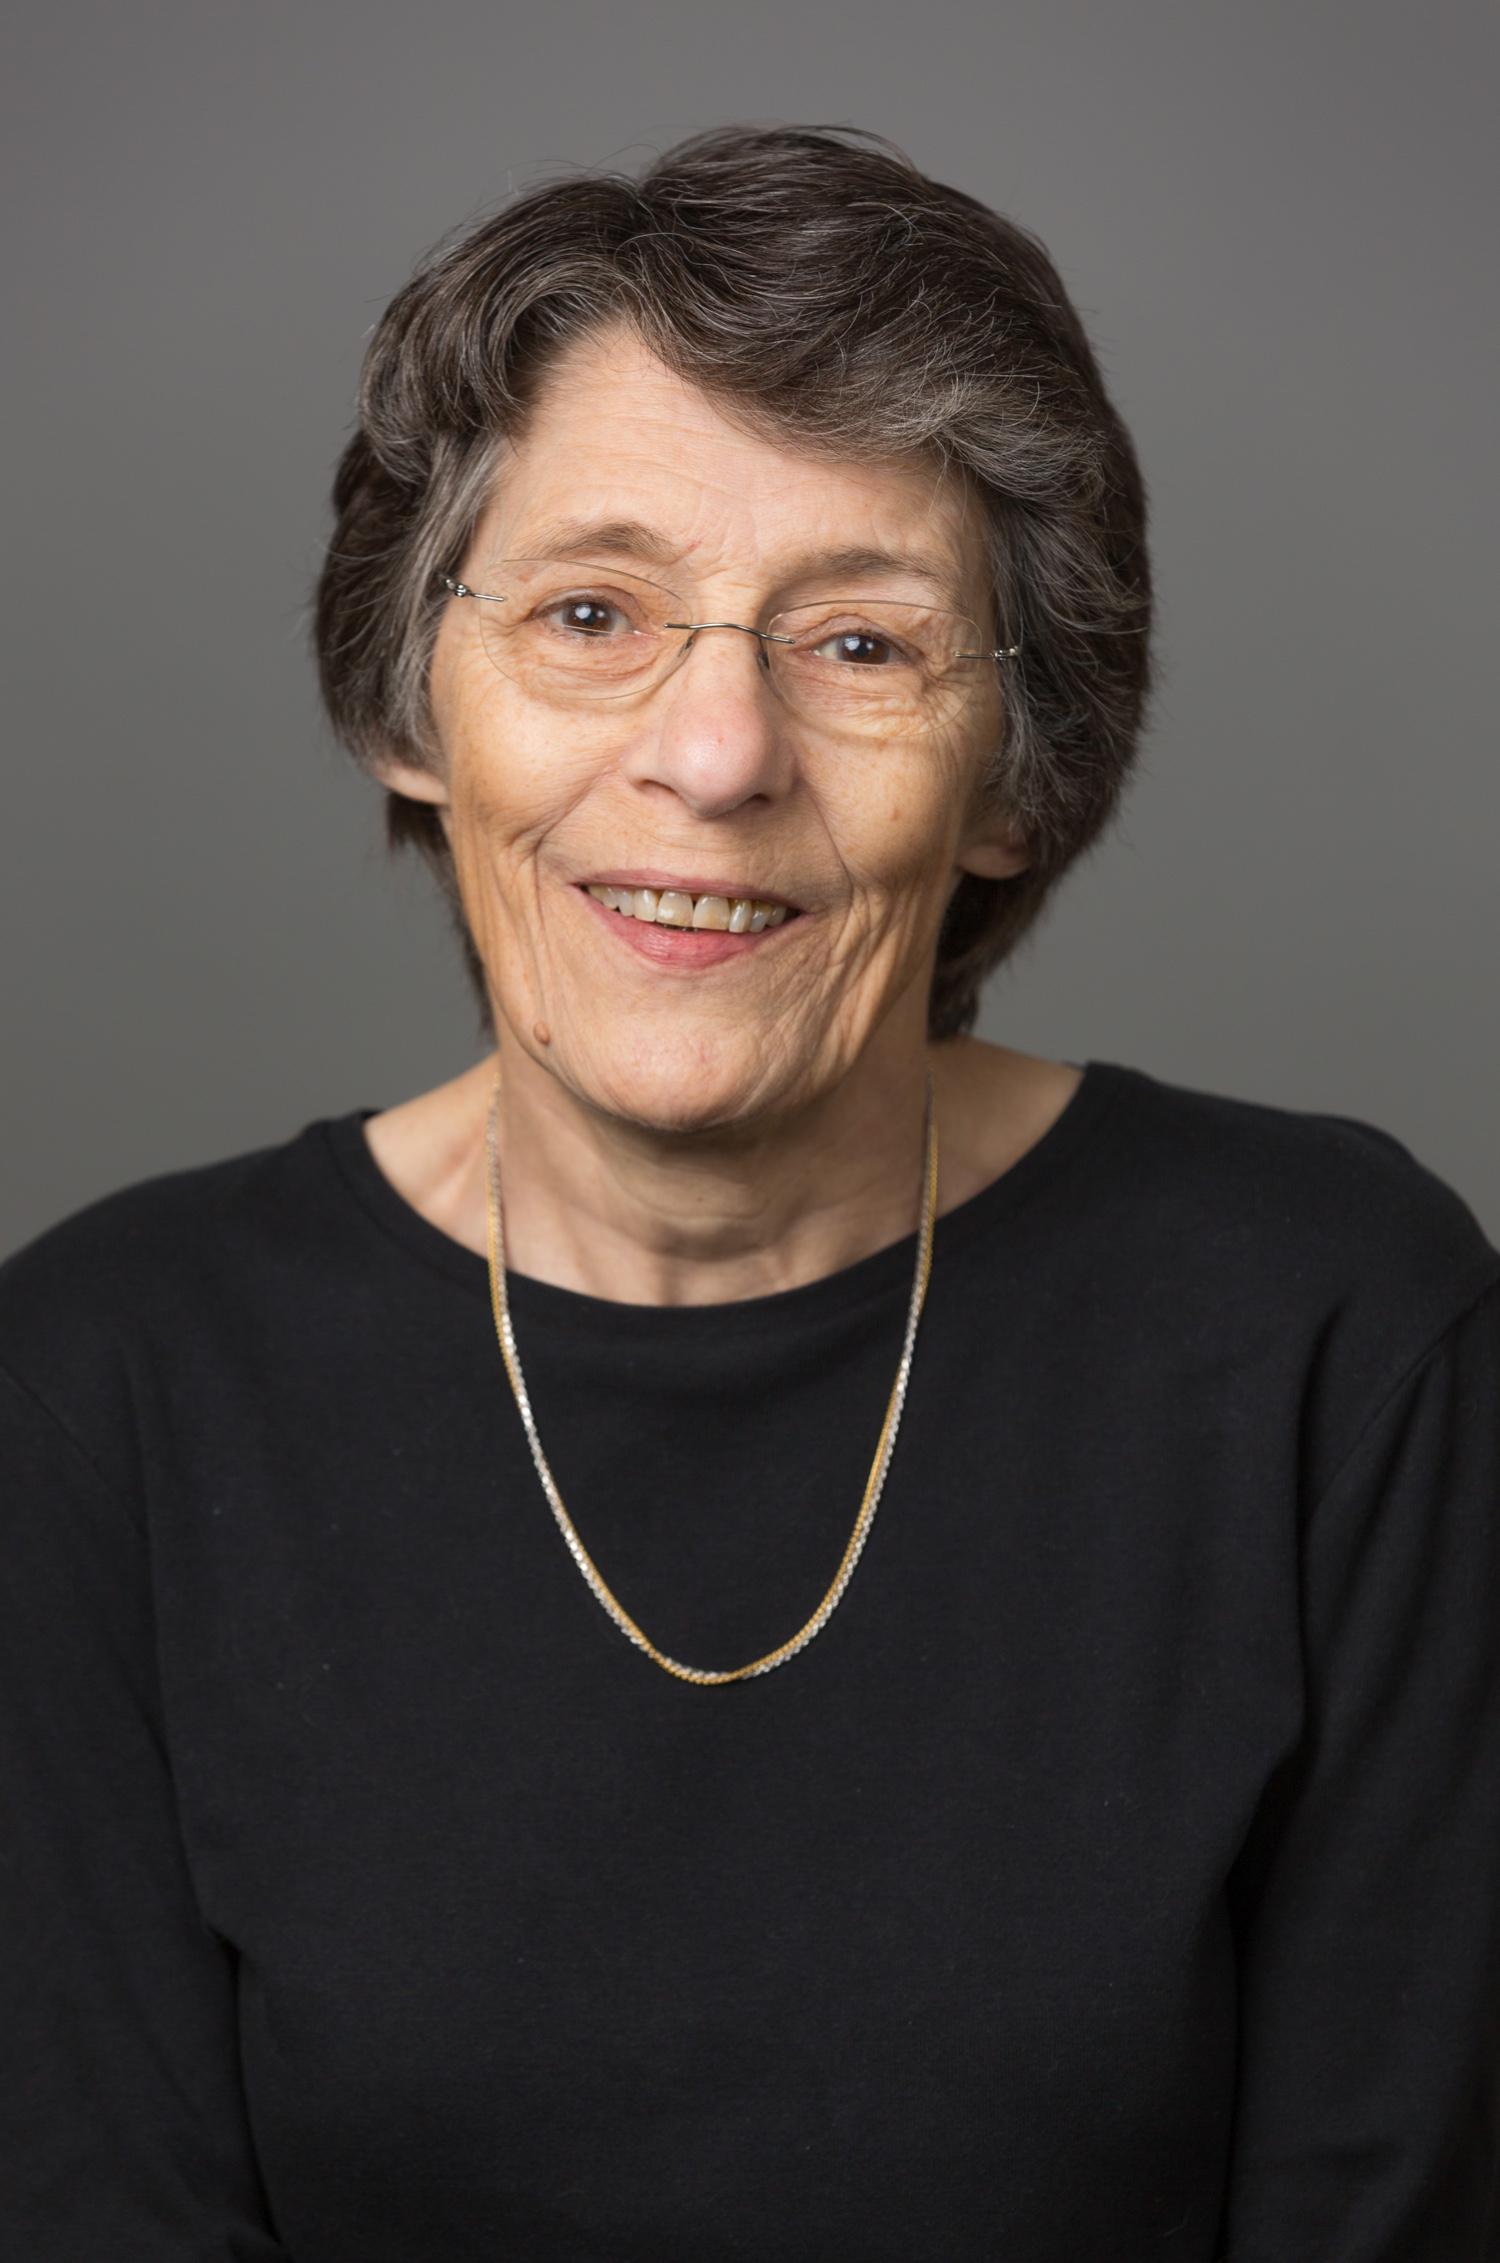 Deborah Gold